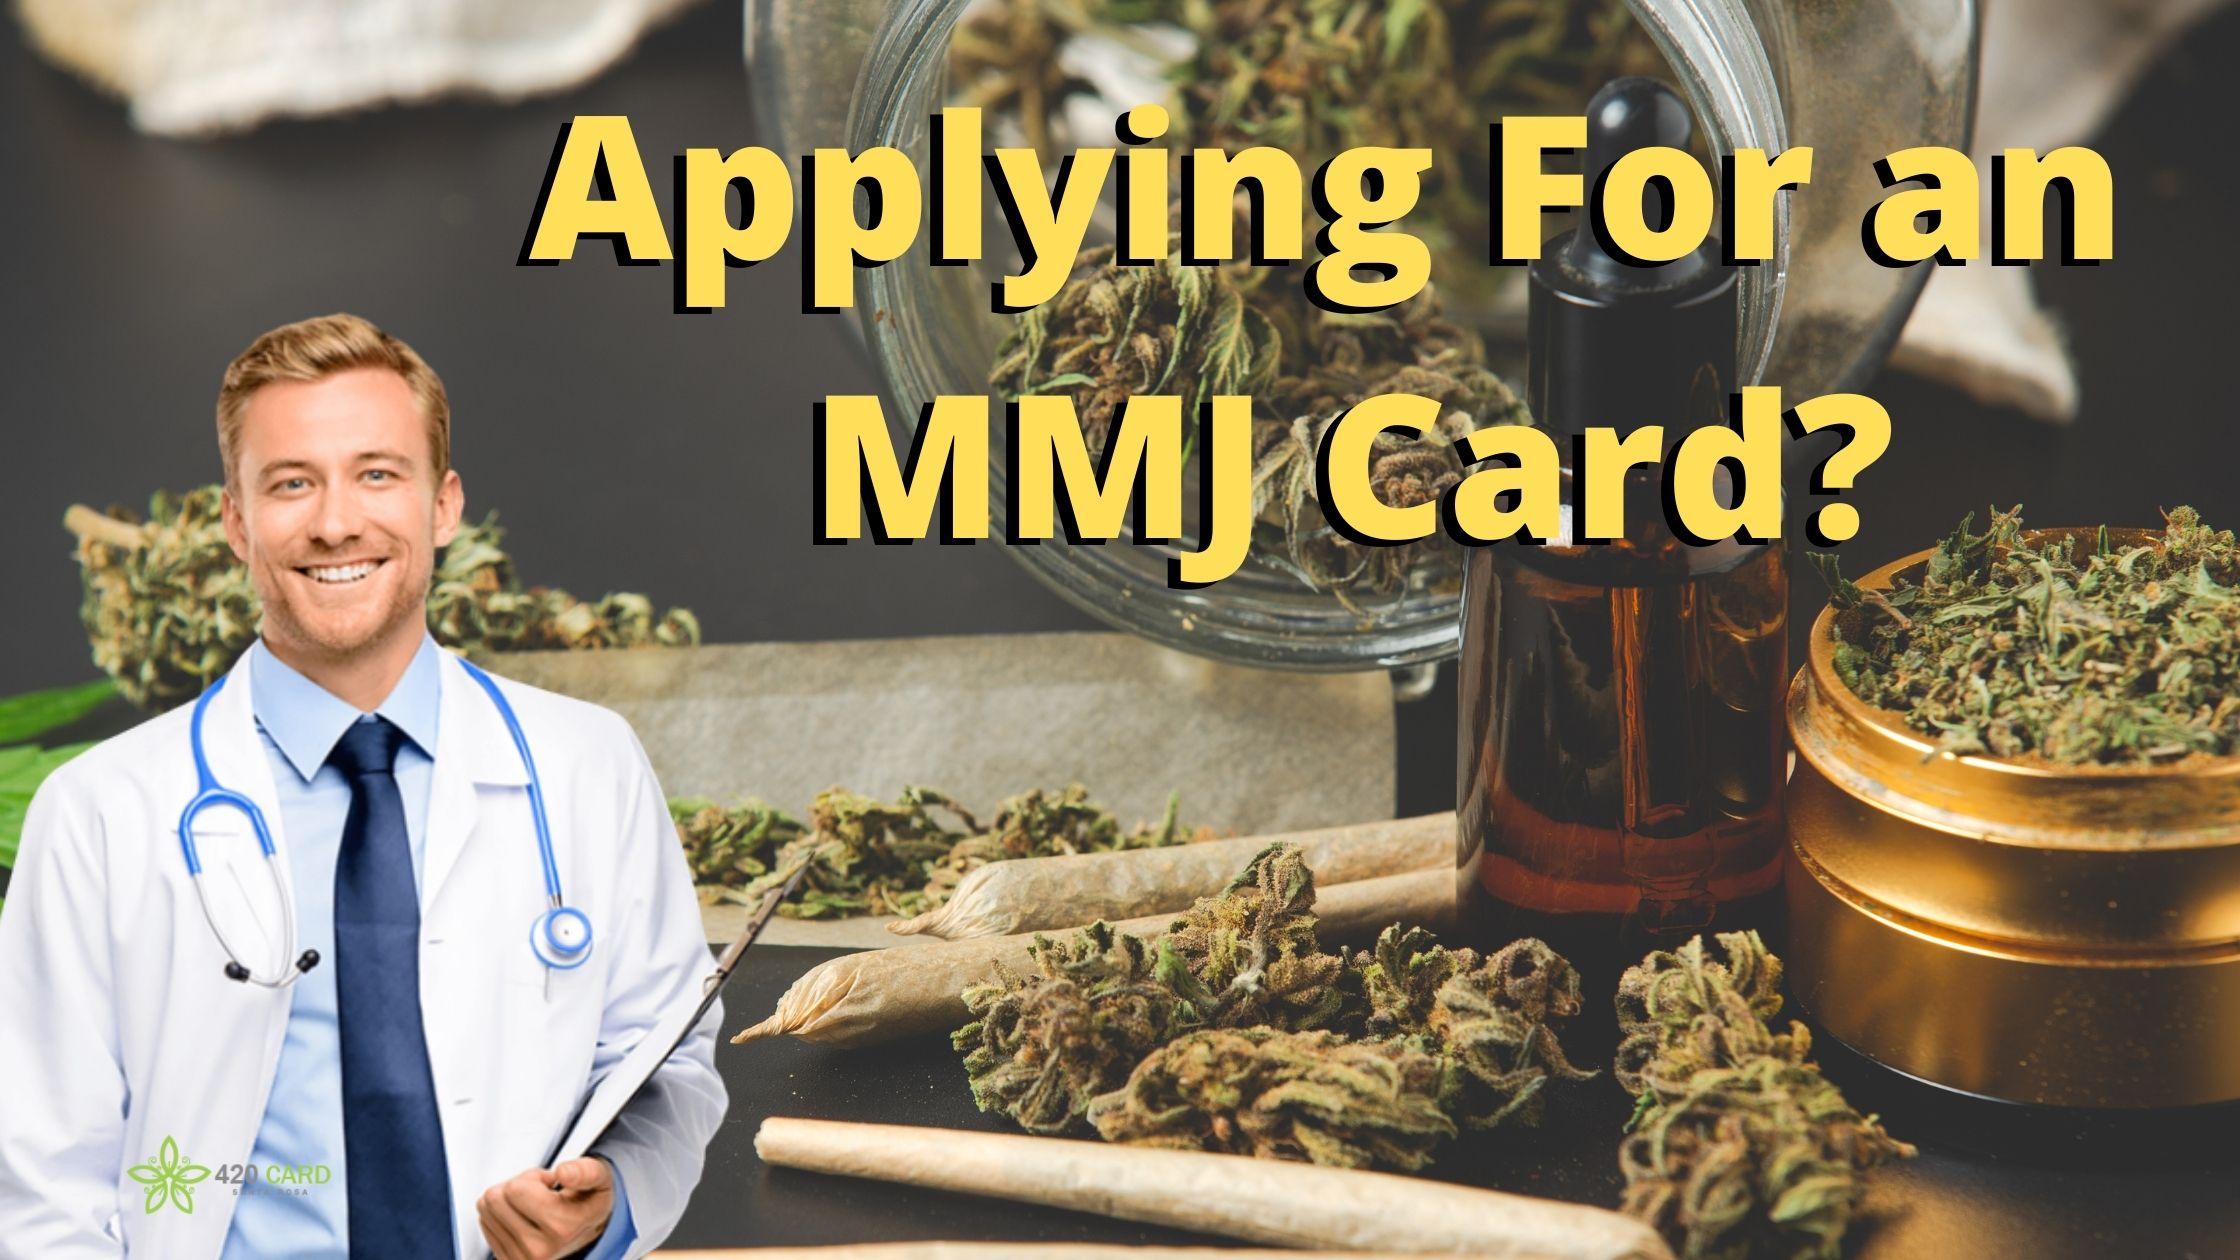 Applying For an MMJ Card